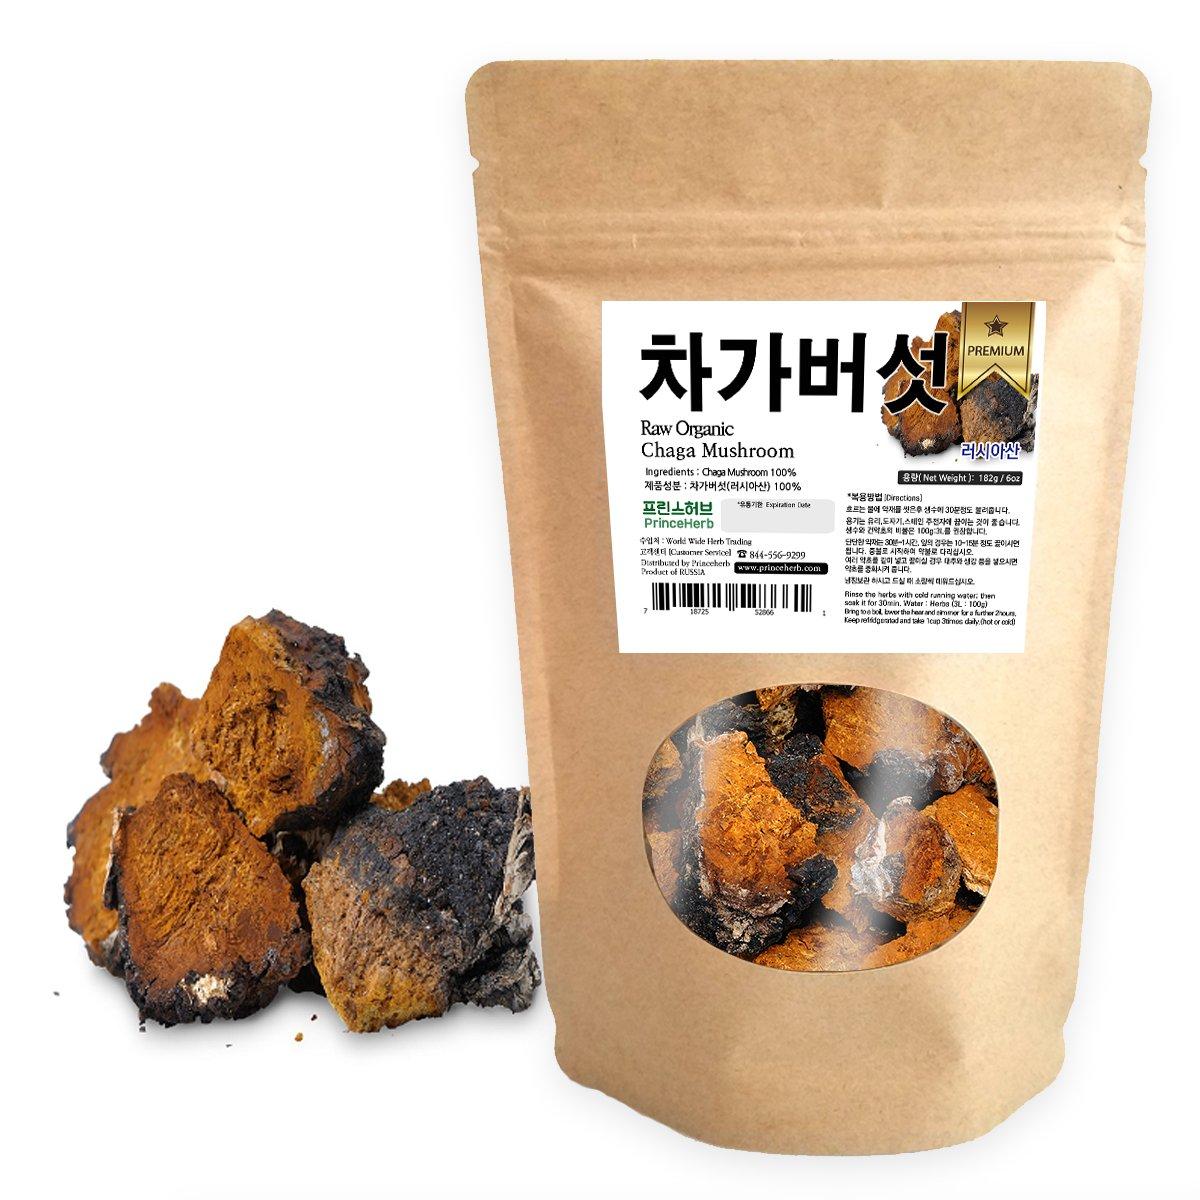 [Medicinal Korean Herb] Premium CHAGA Mushroom ( Shirakabatake / 차가버섯 ) Dried Bulk Herbs 182g ( 6oz )